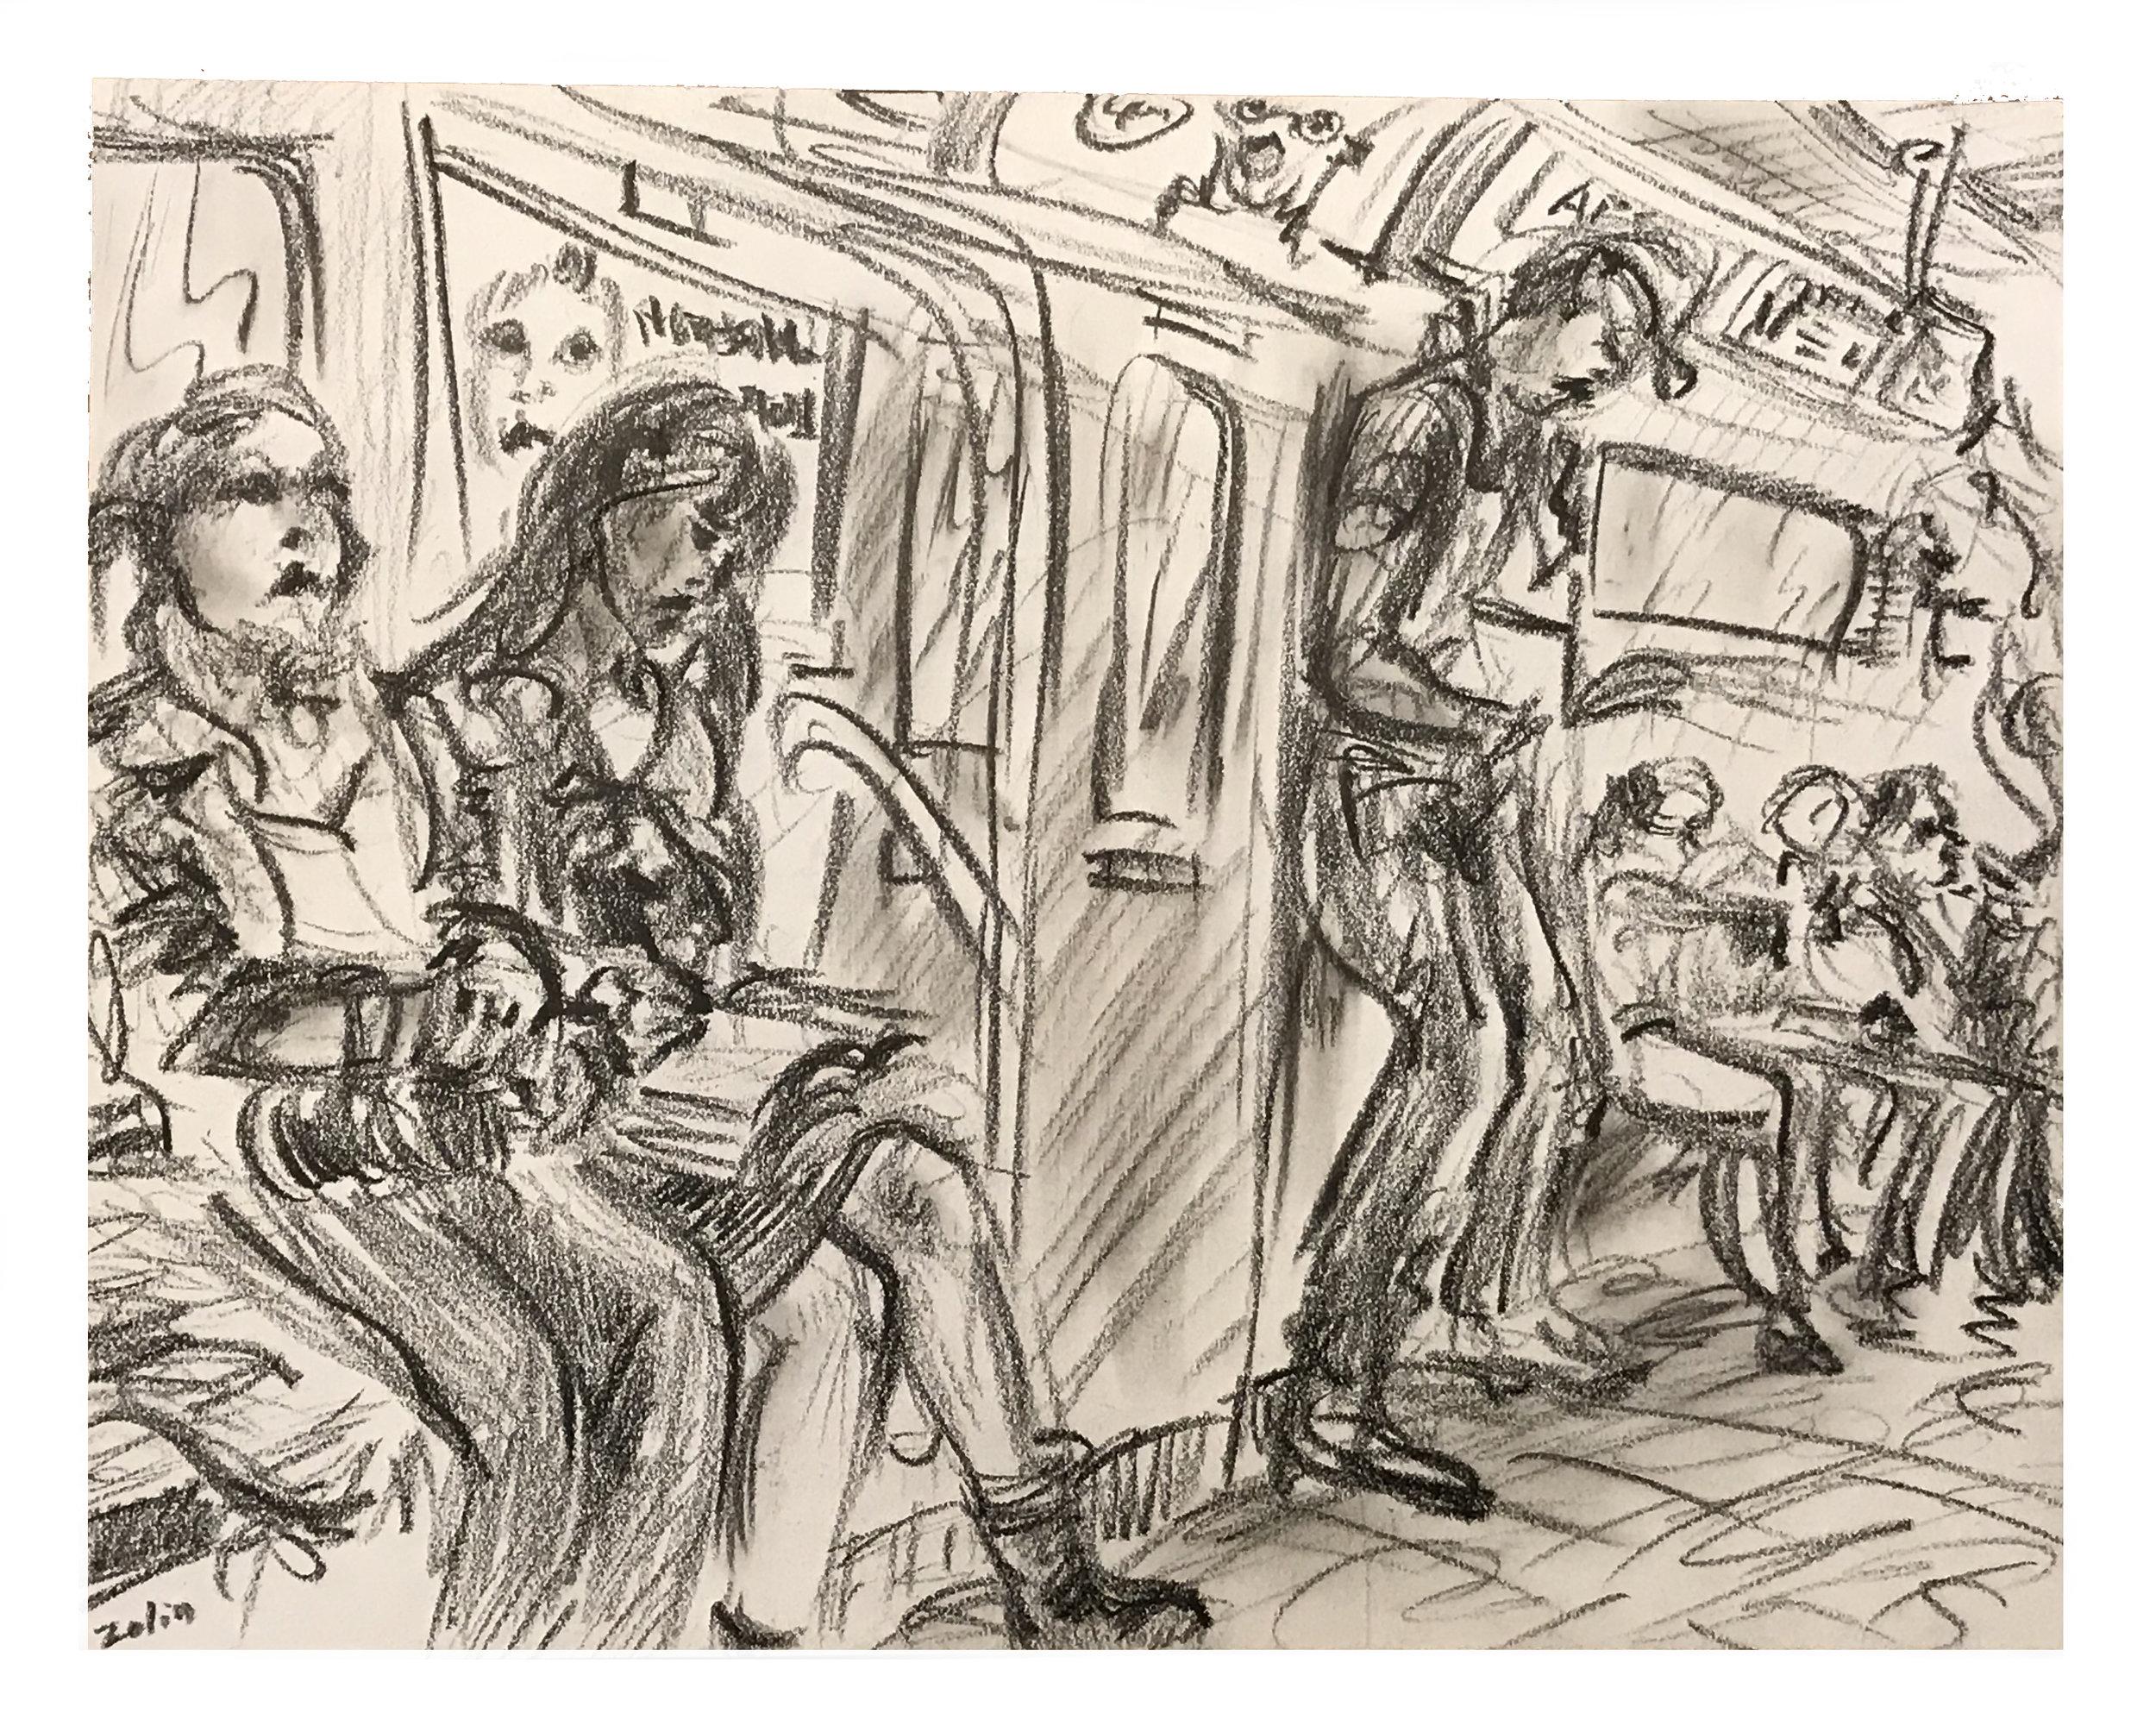 Subway Series 2